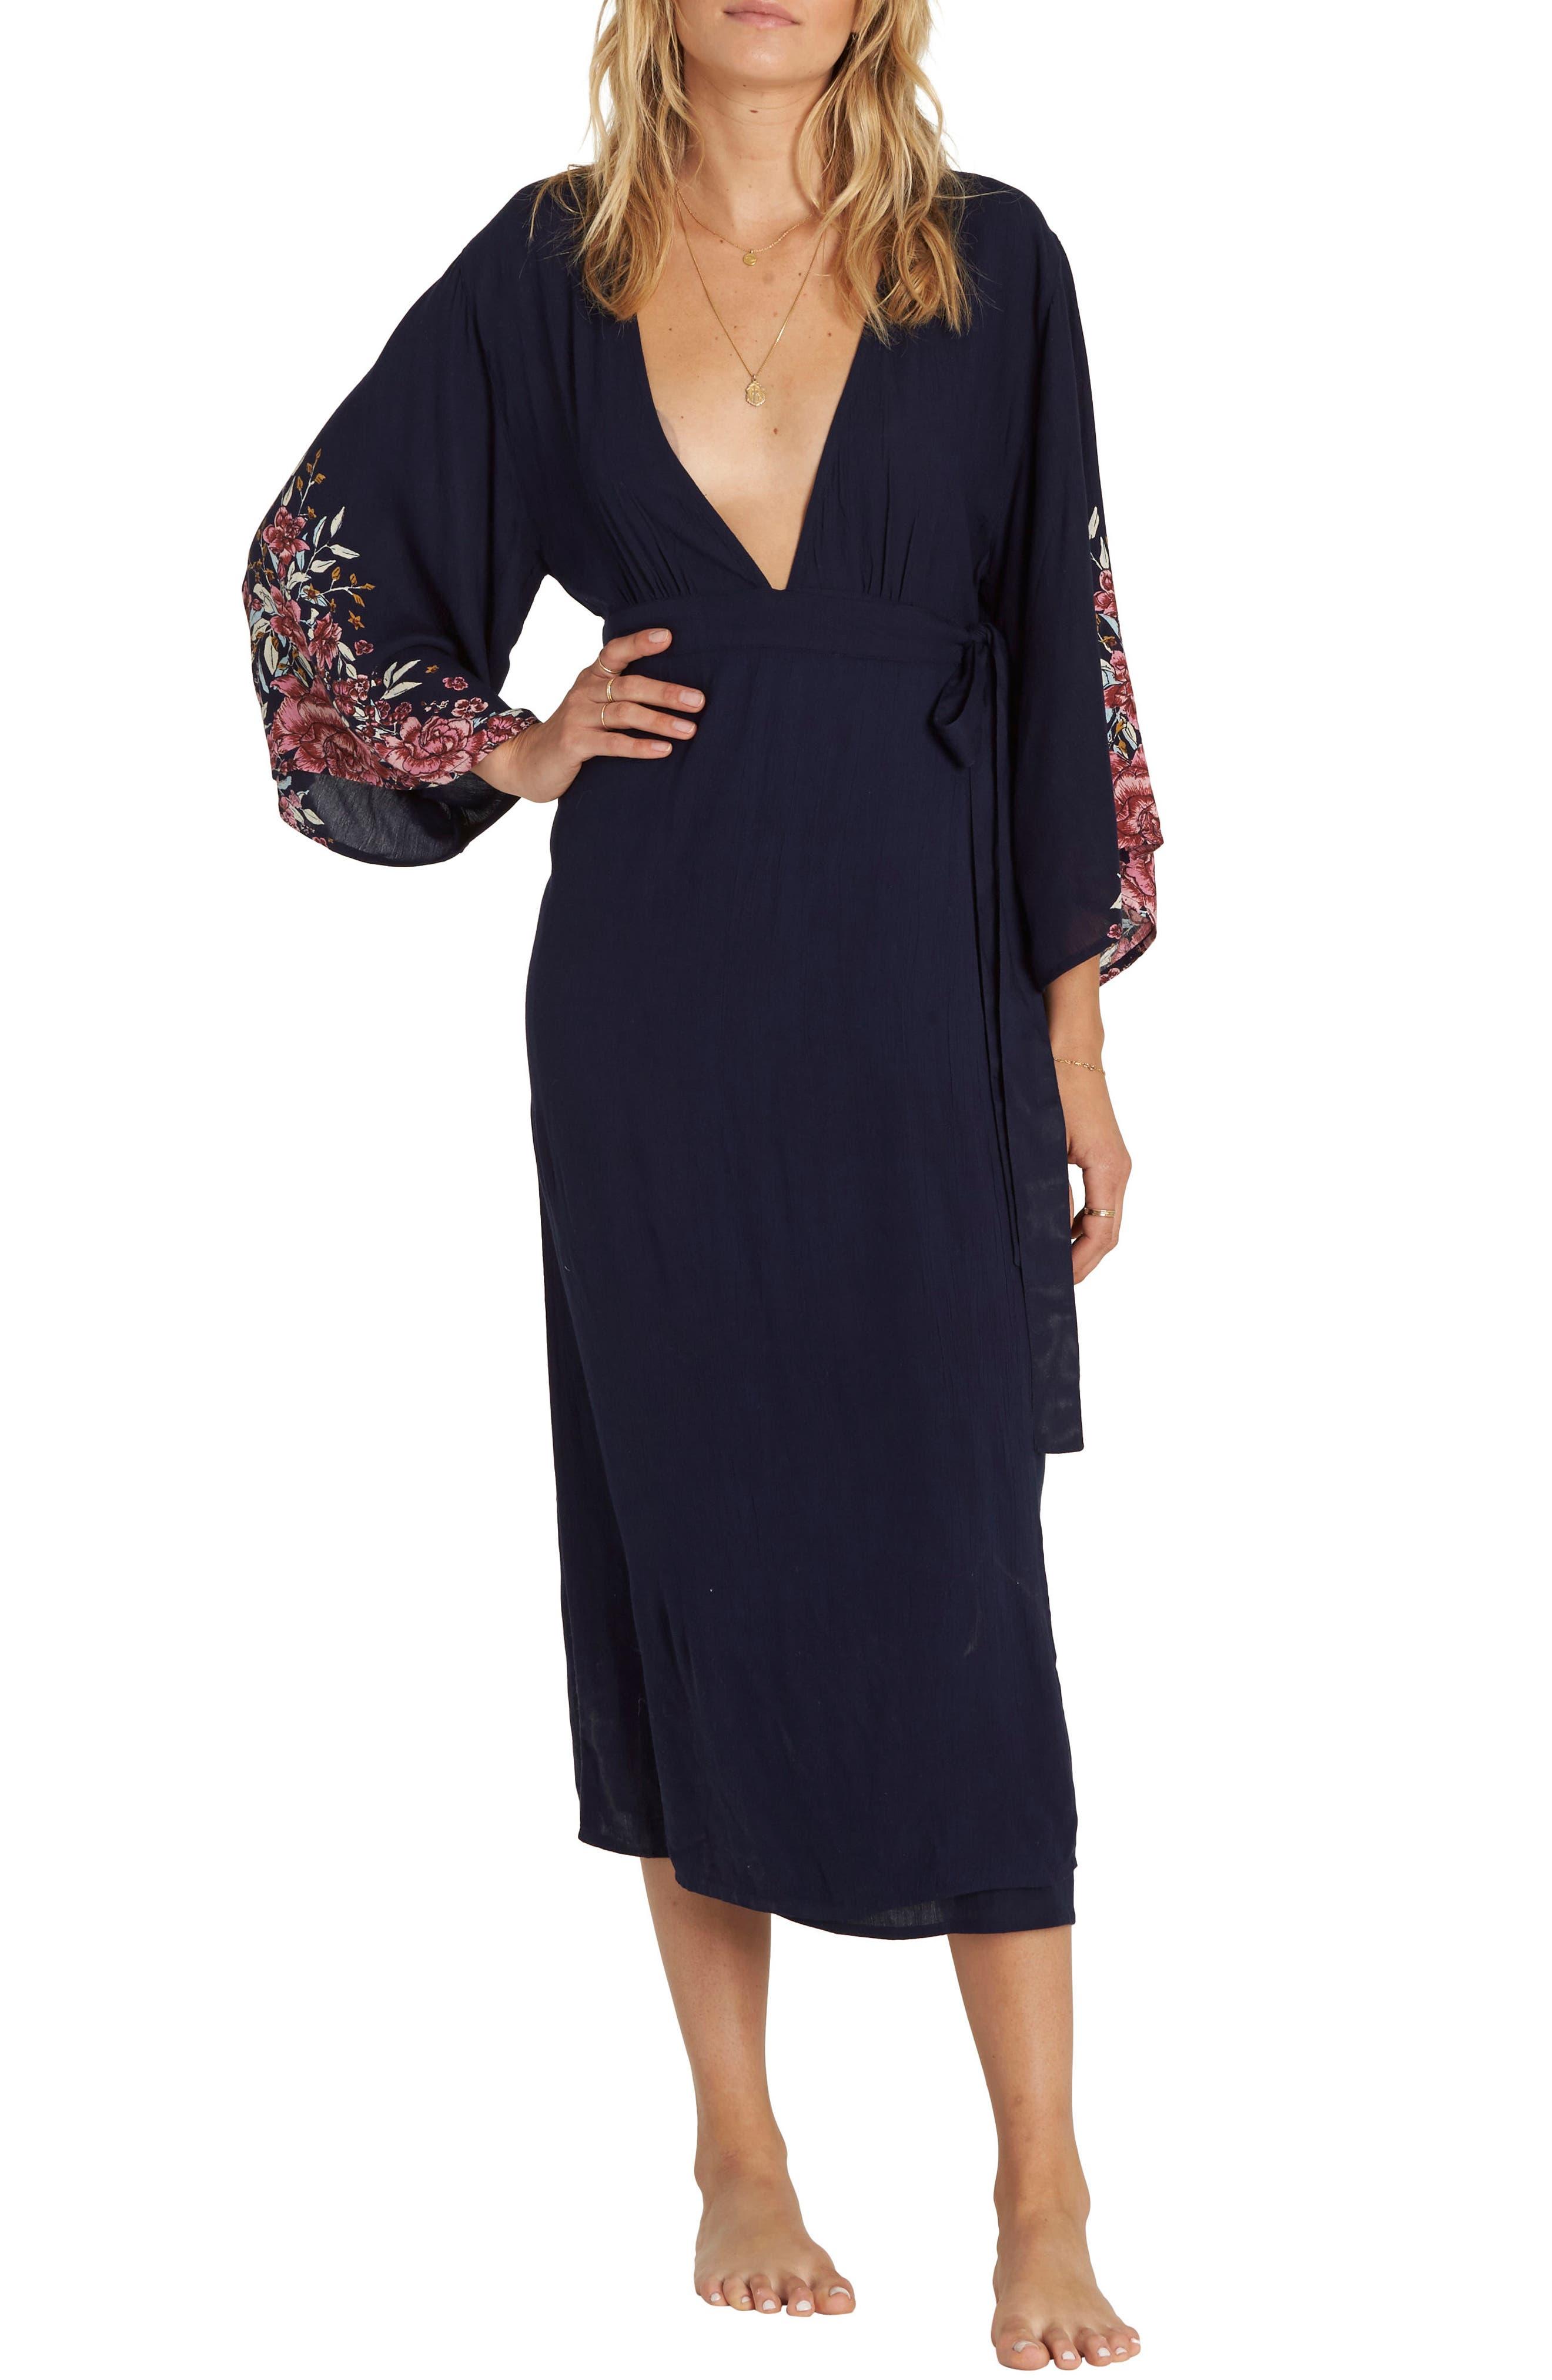 Robe Life Midi Dress,                         Main,                         color,